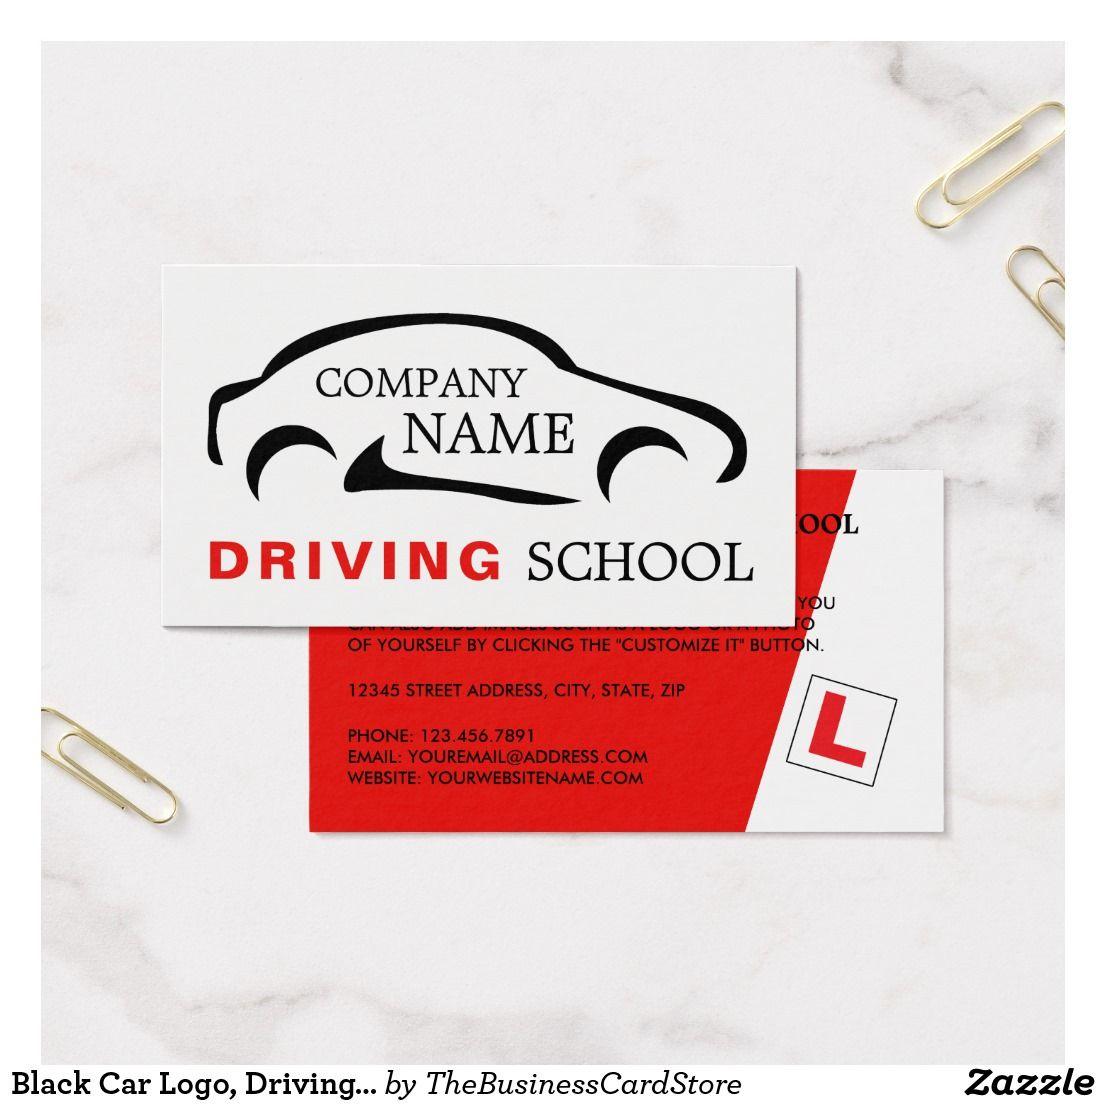 Black Car Logo Driving School Instructor Business Card Zazzle Com Black Car Car Logos Driving School